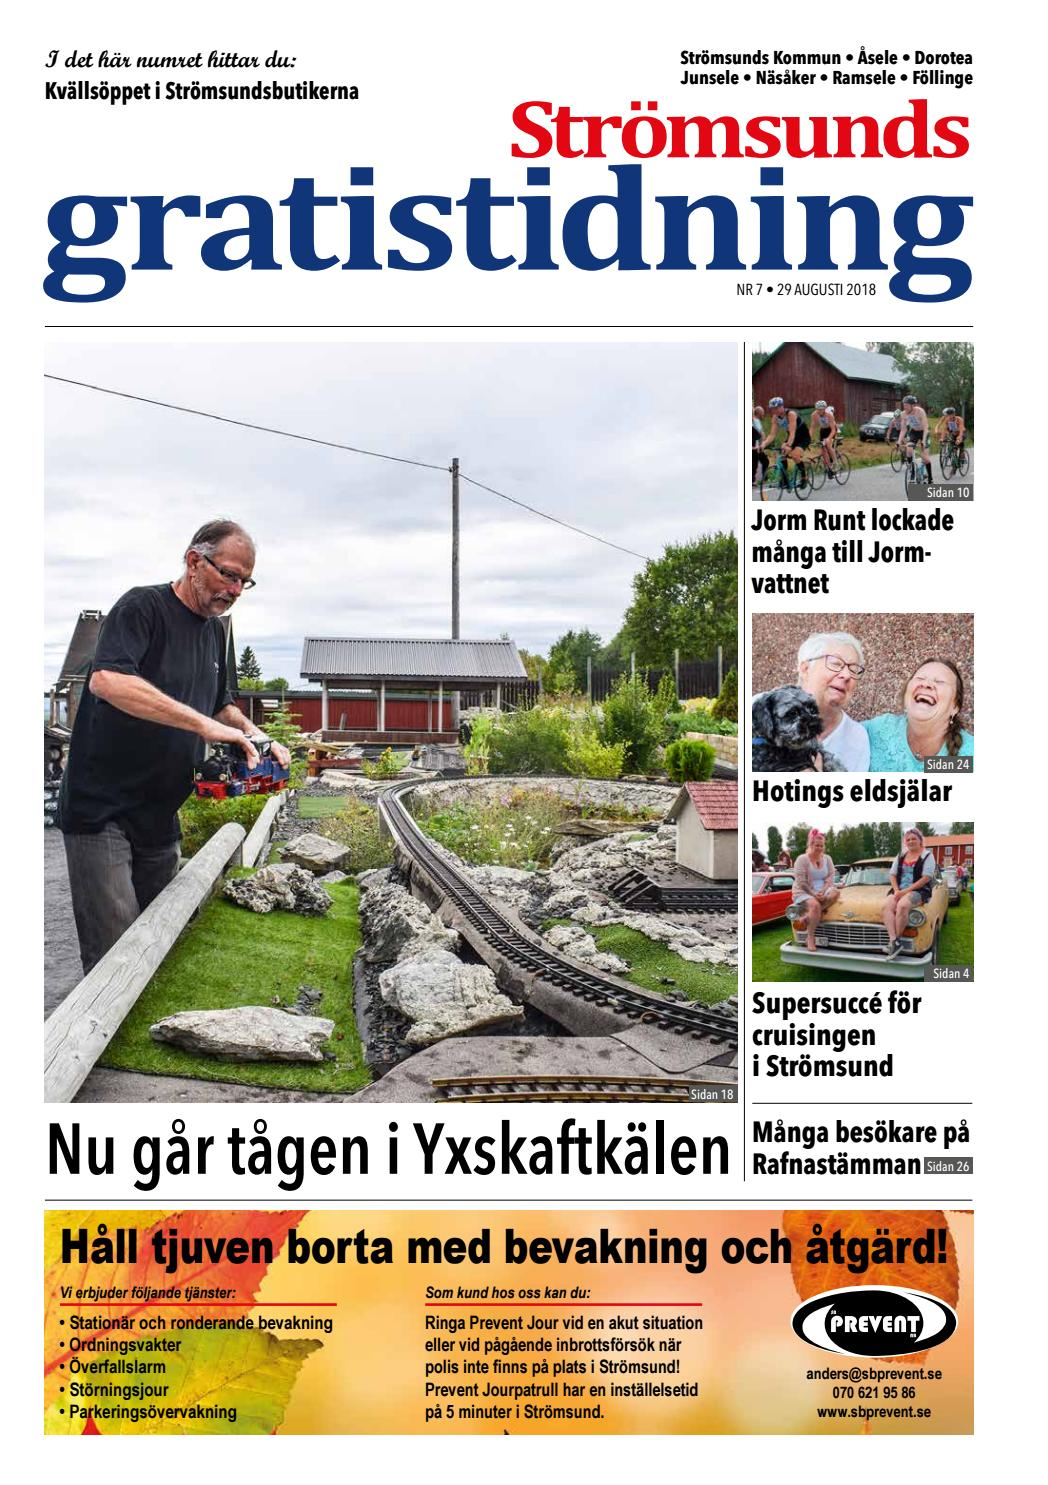 Katarina Bjelke, 56 r i Hoting p Kyrktsj Nyvgen 10